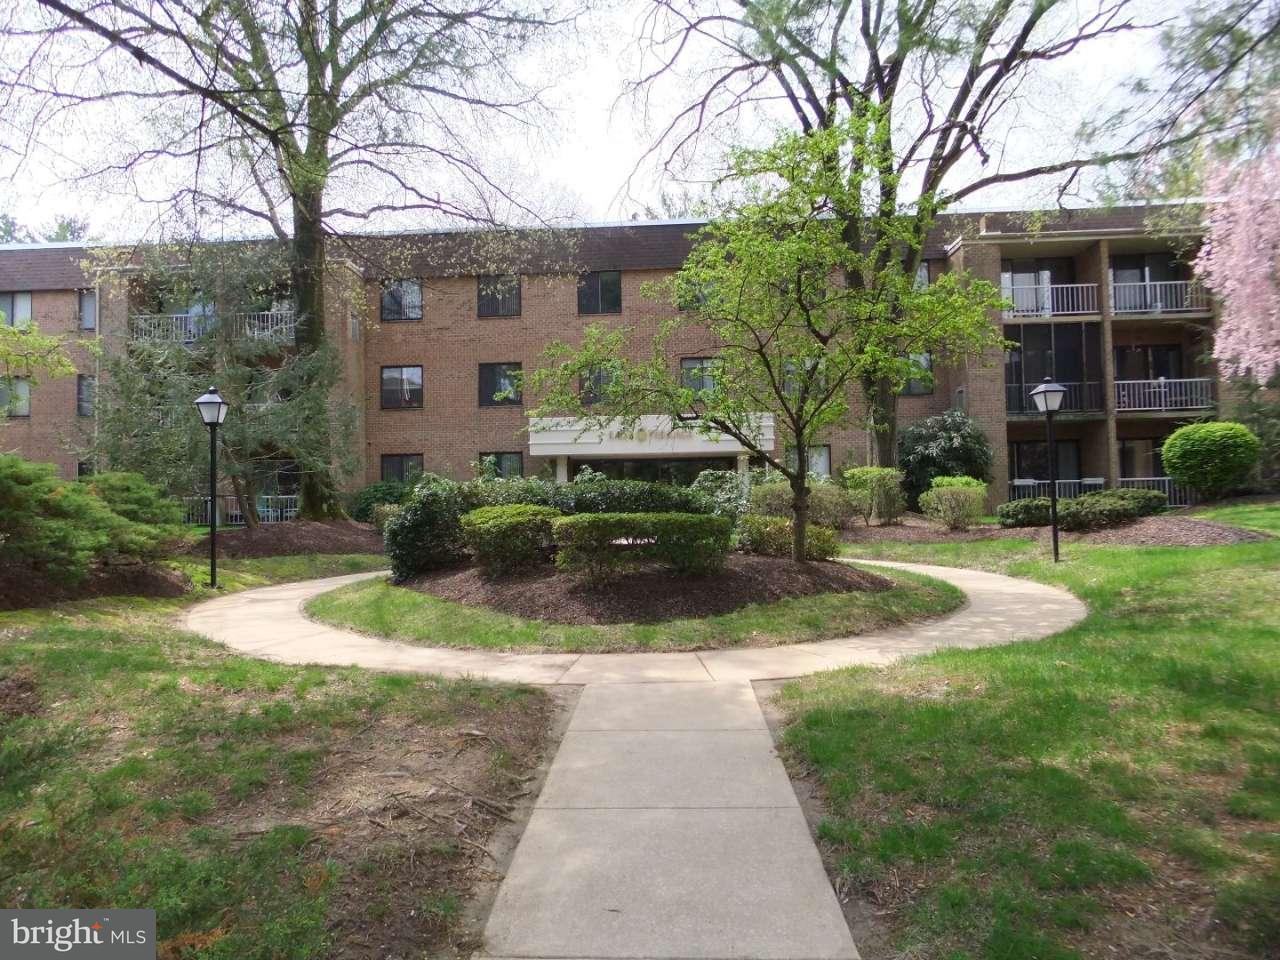 Condominium for Rent at 1650 OAKWOOD DR #E103 Narberth, Pennsylvania 19072 United States